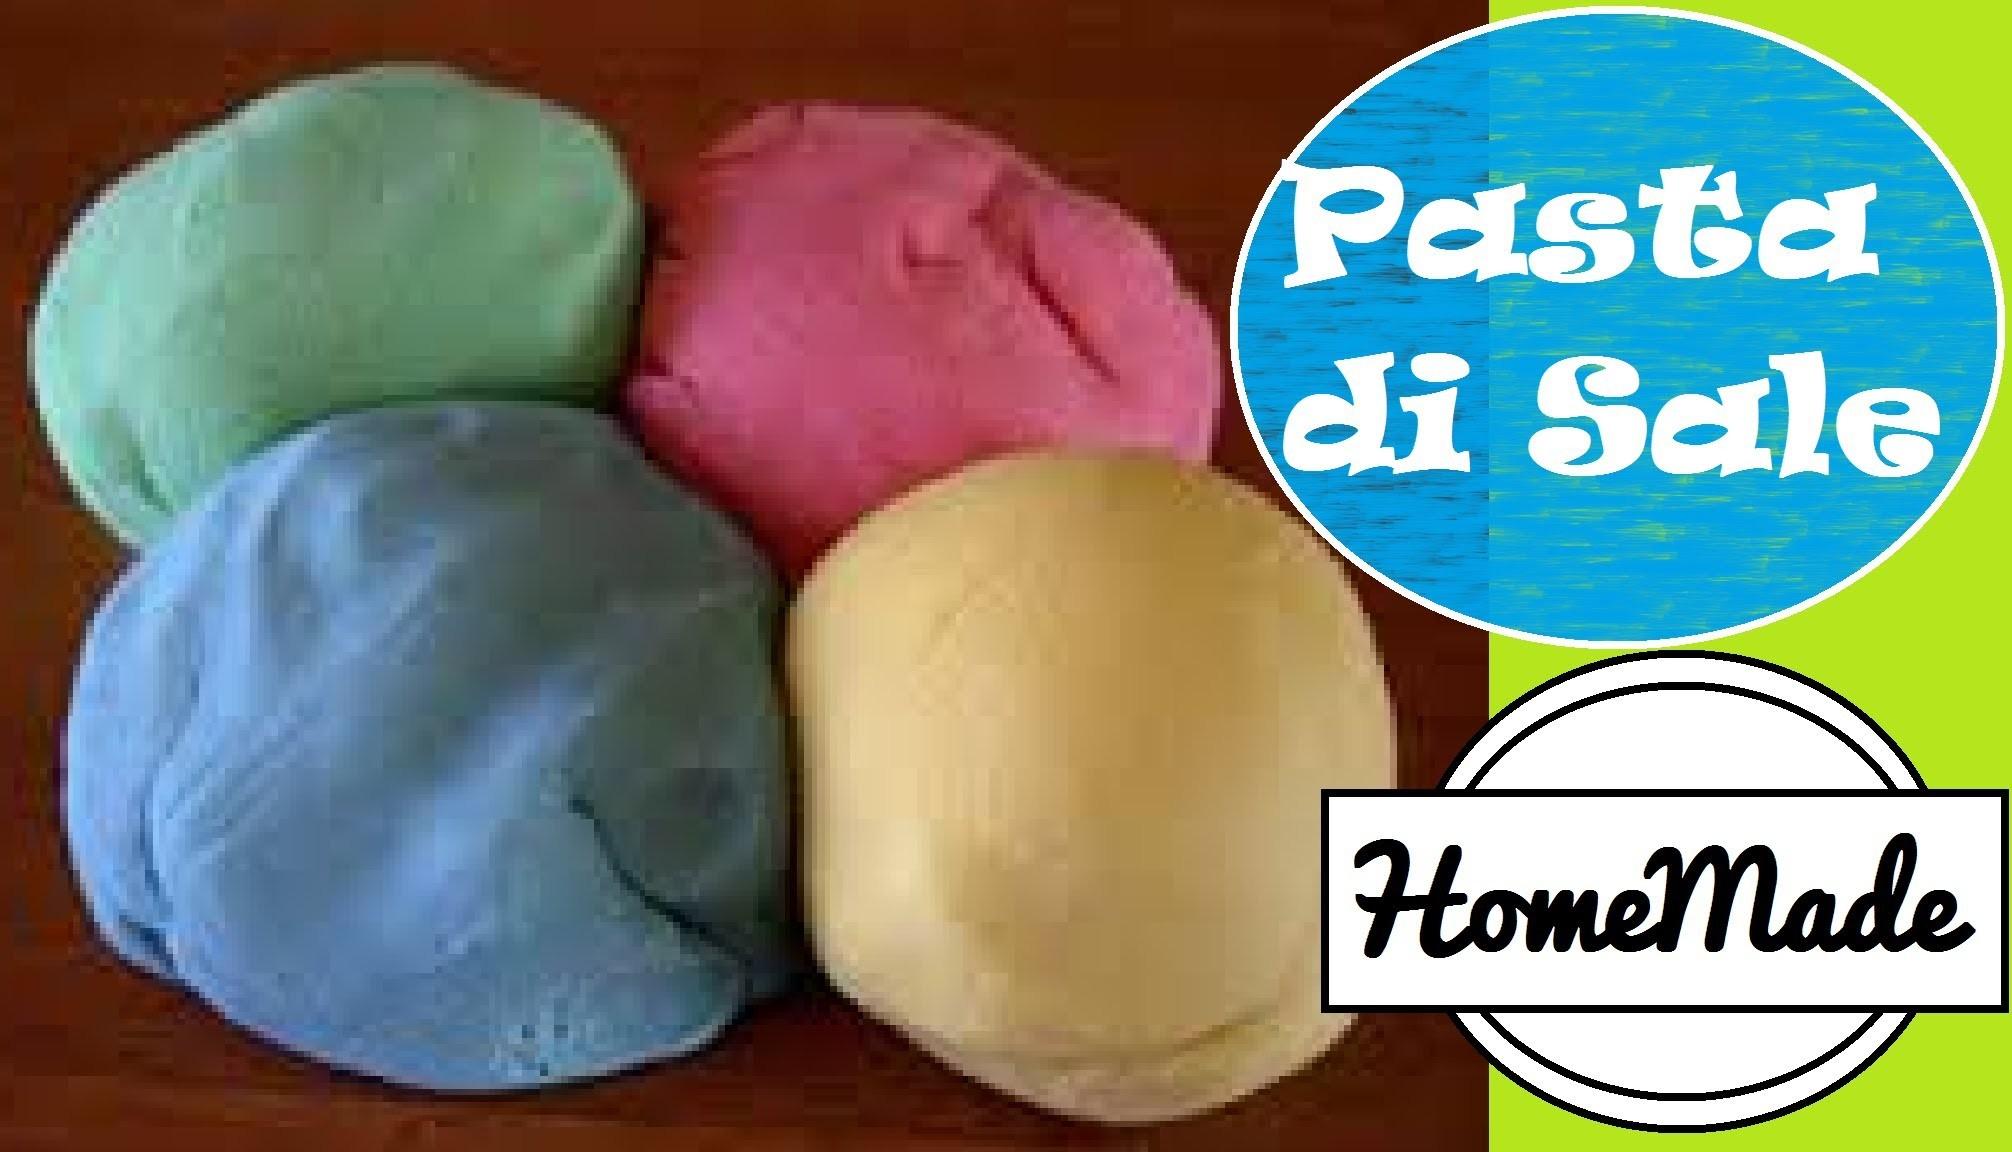 DIY - Pasta di sale da modellare fai da te - giochi per i  bimbi